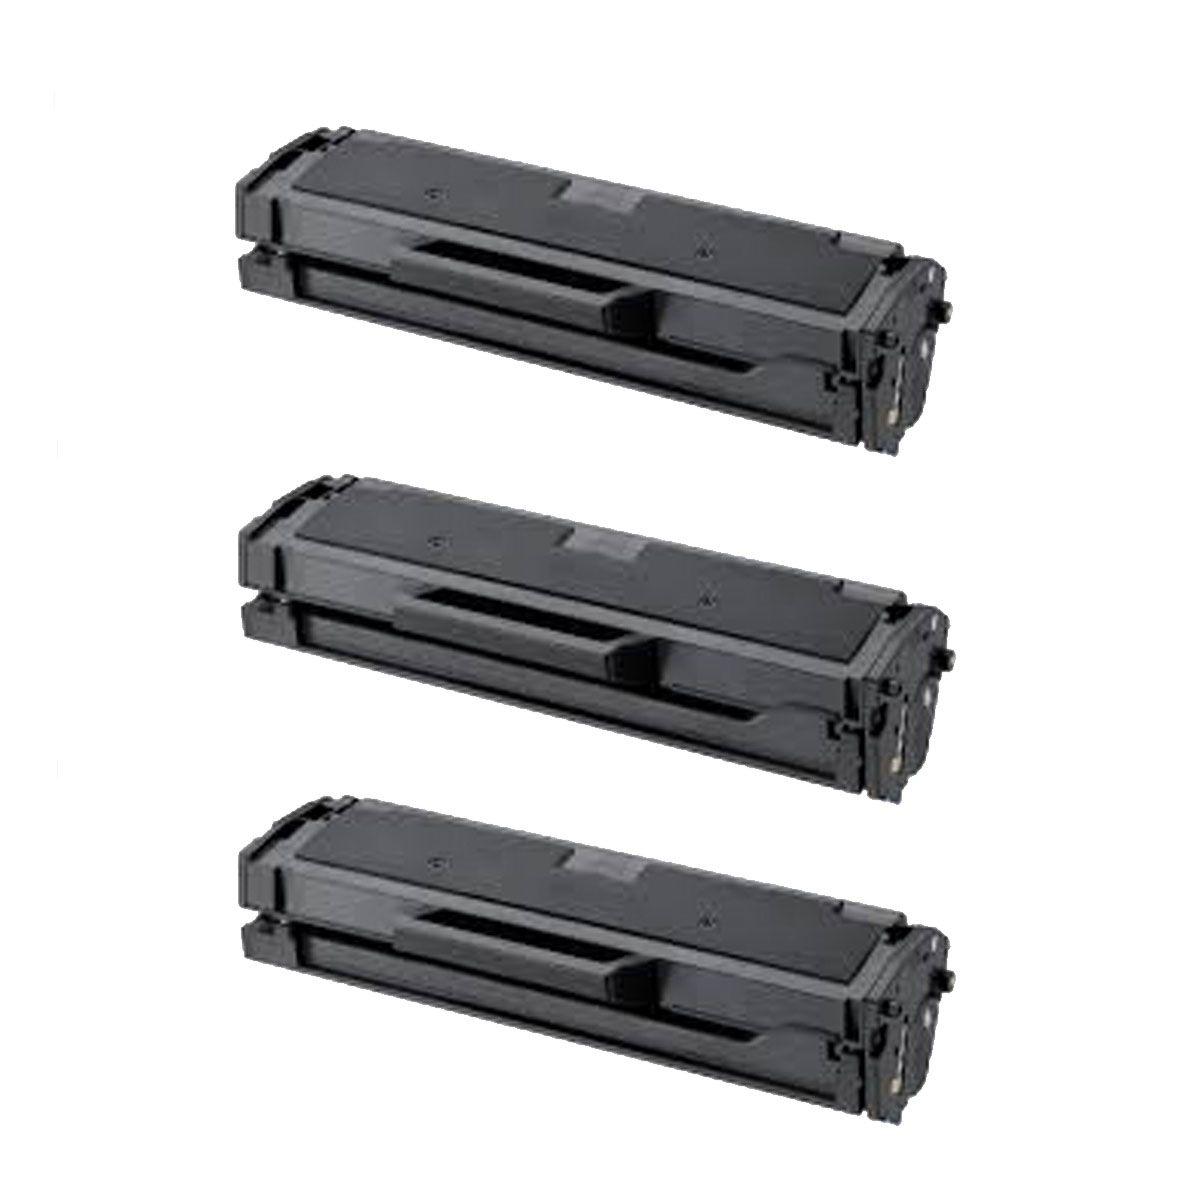 3 Toner para impressoras M2020 M2070 - D111